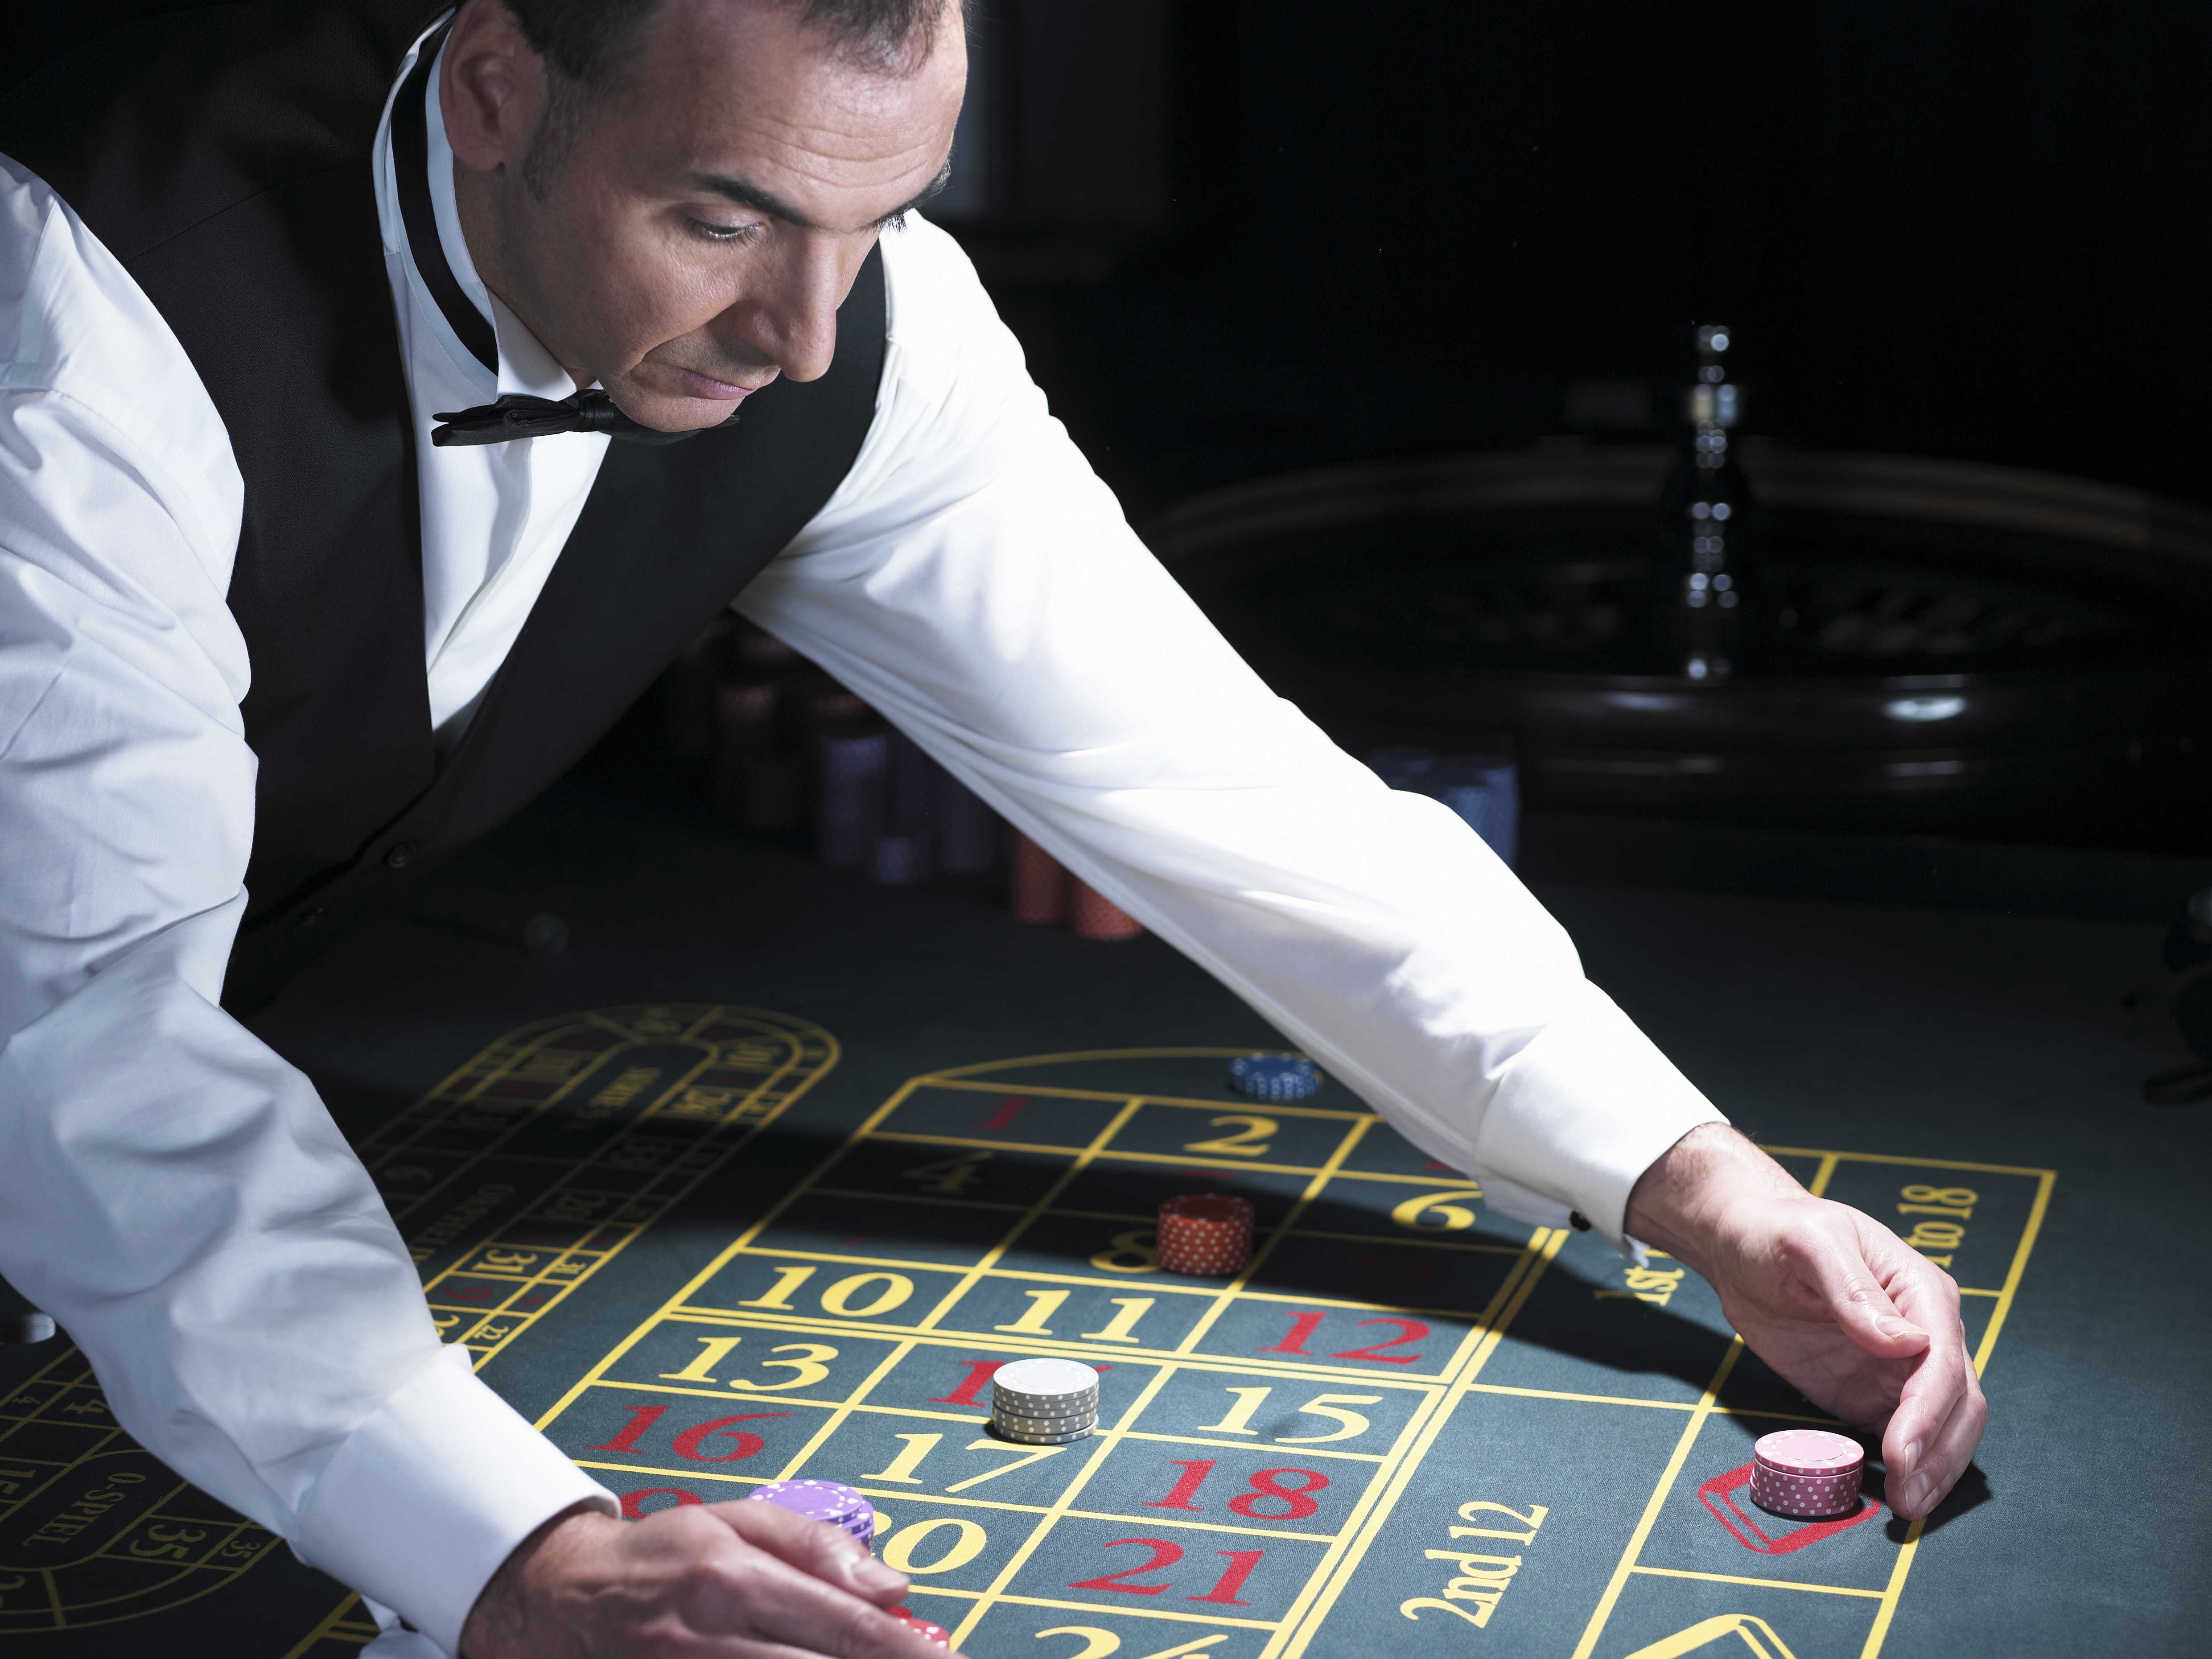 Casino compliance officer salary chuckchansi casino steak house